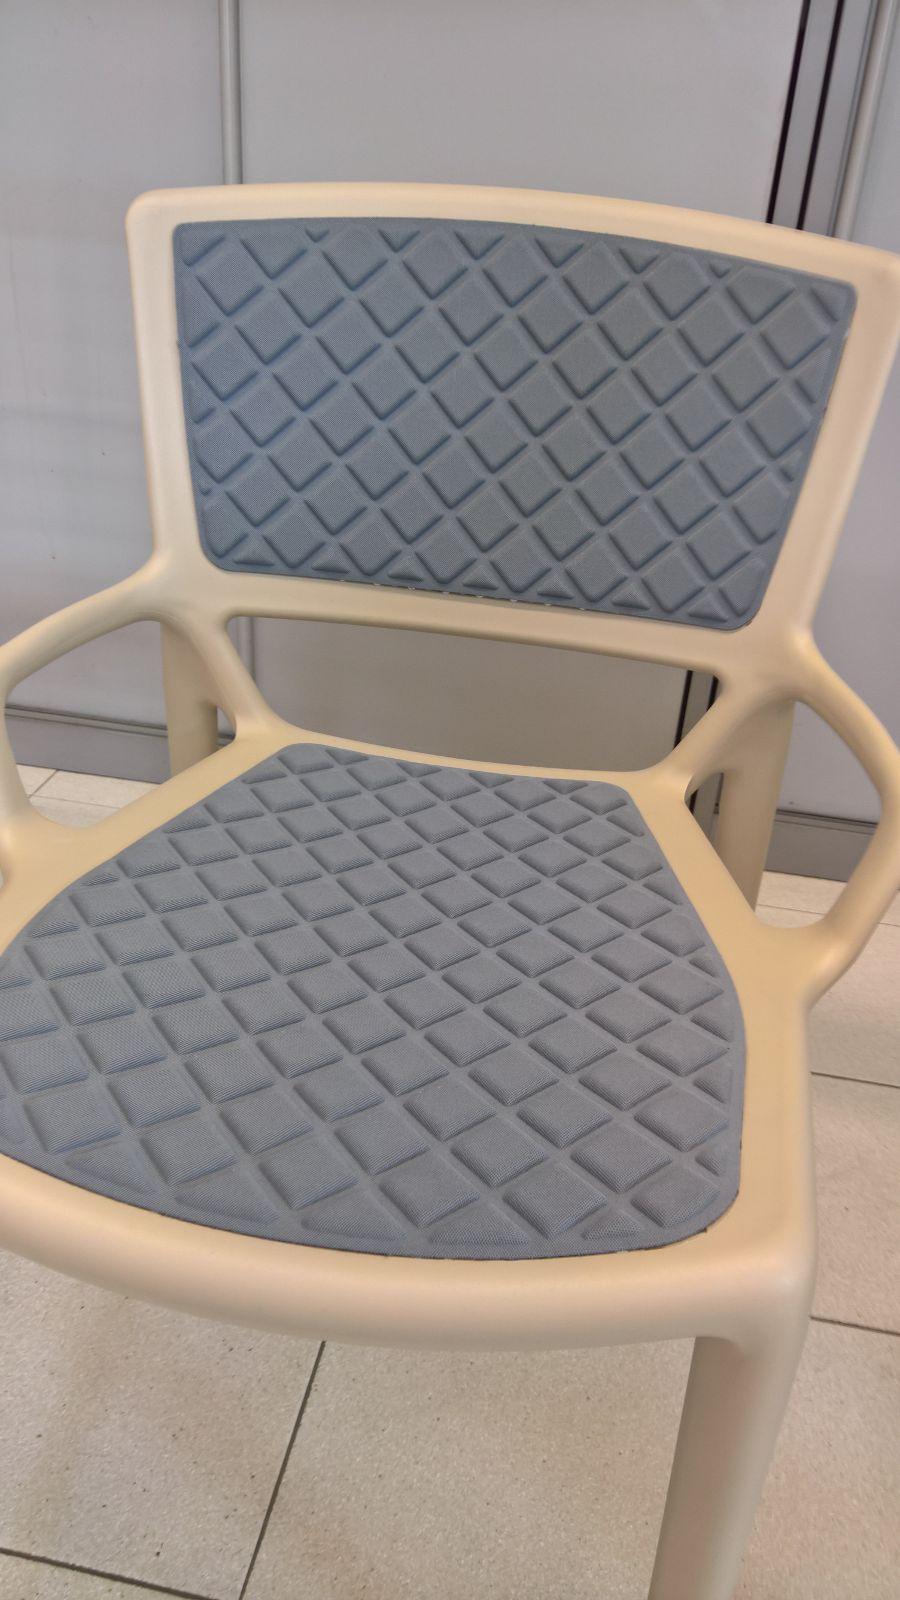 Cuscini per sedie design Teamform